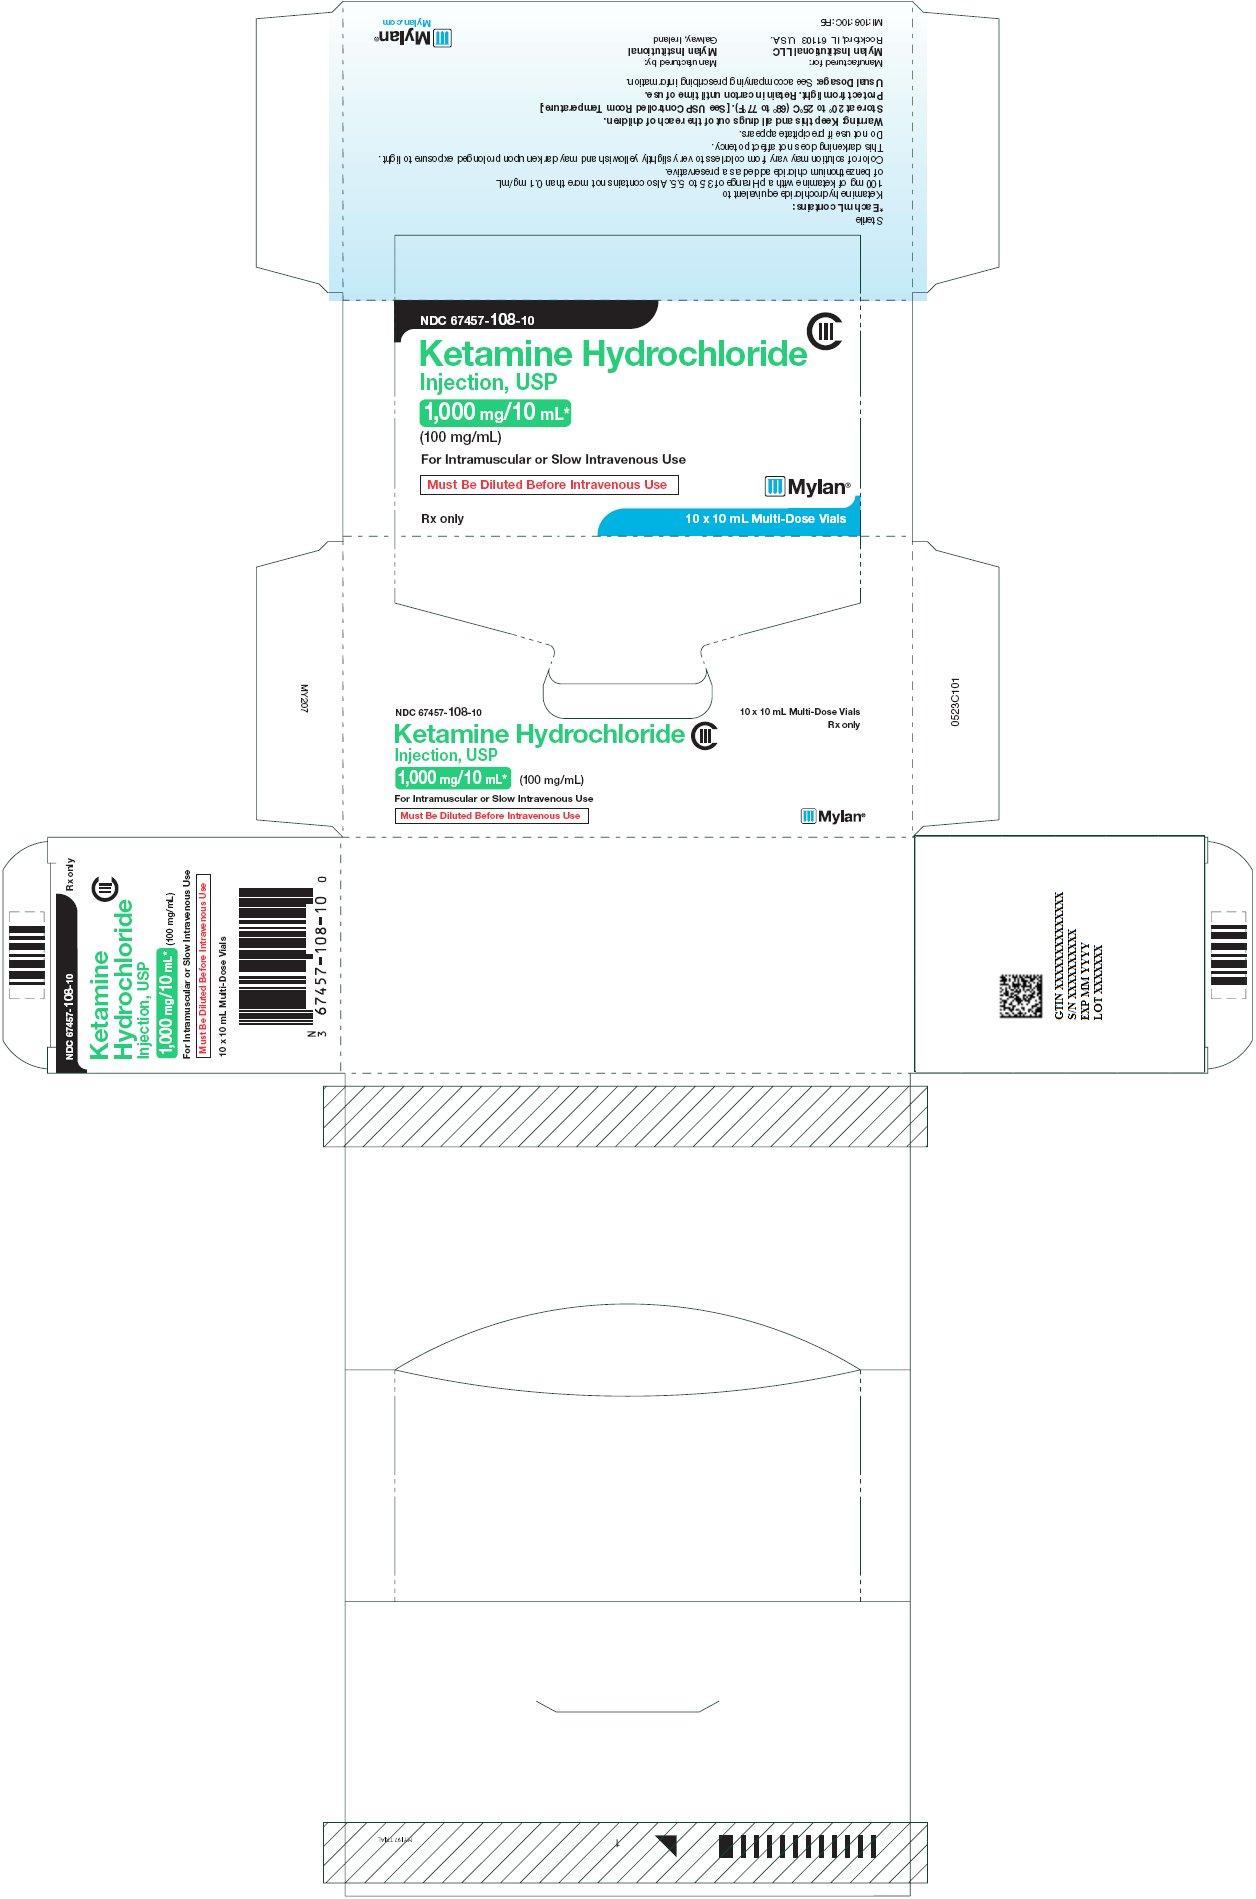 Ketamine Hydrochloride Injection 1000 mg/10 mL Carton Label